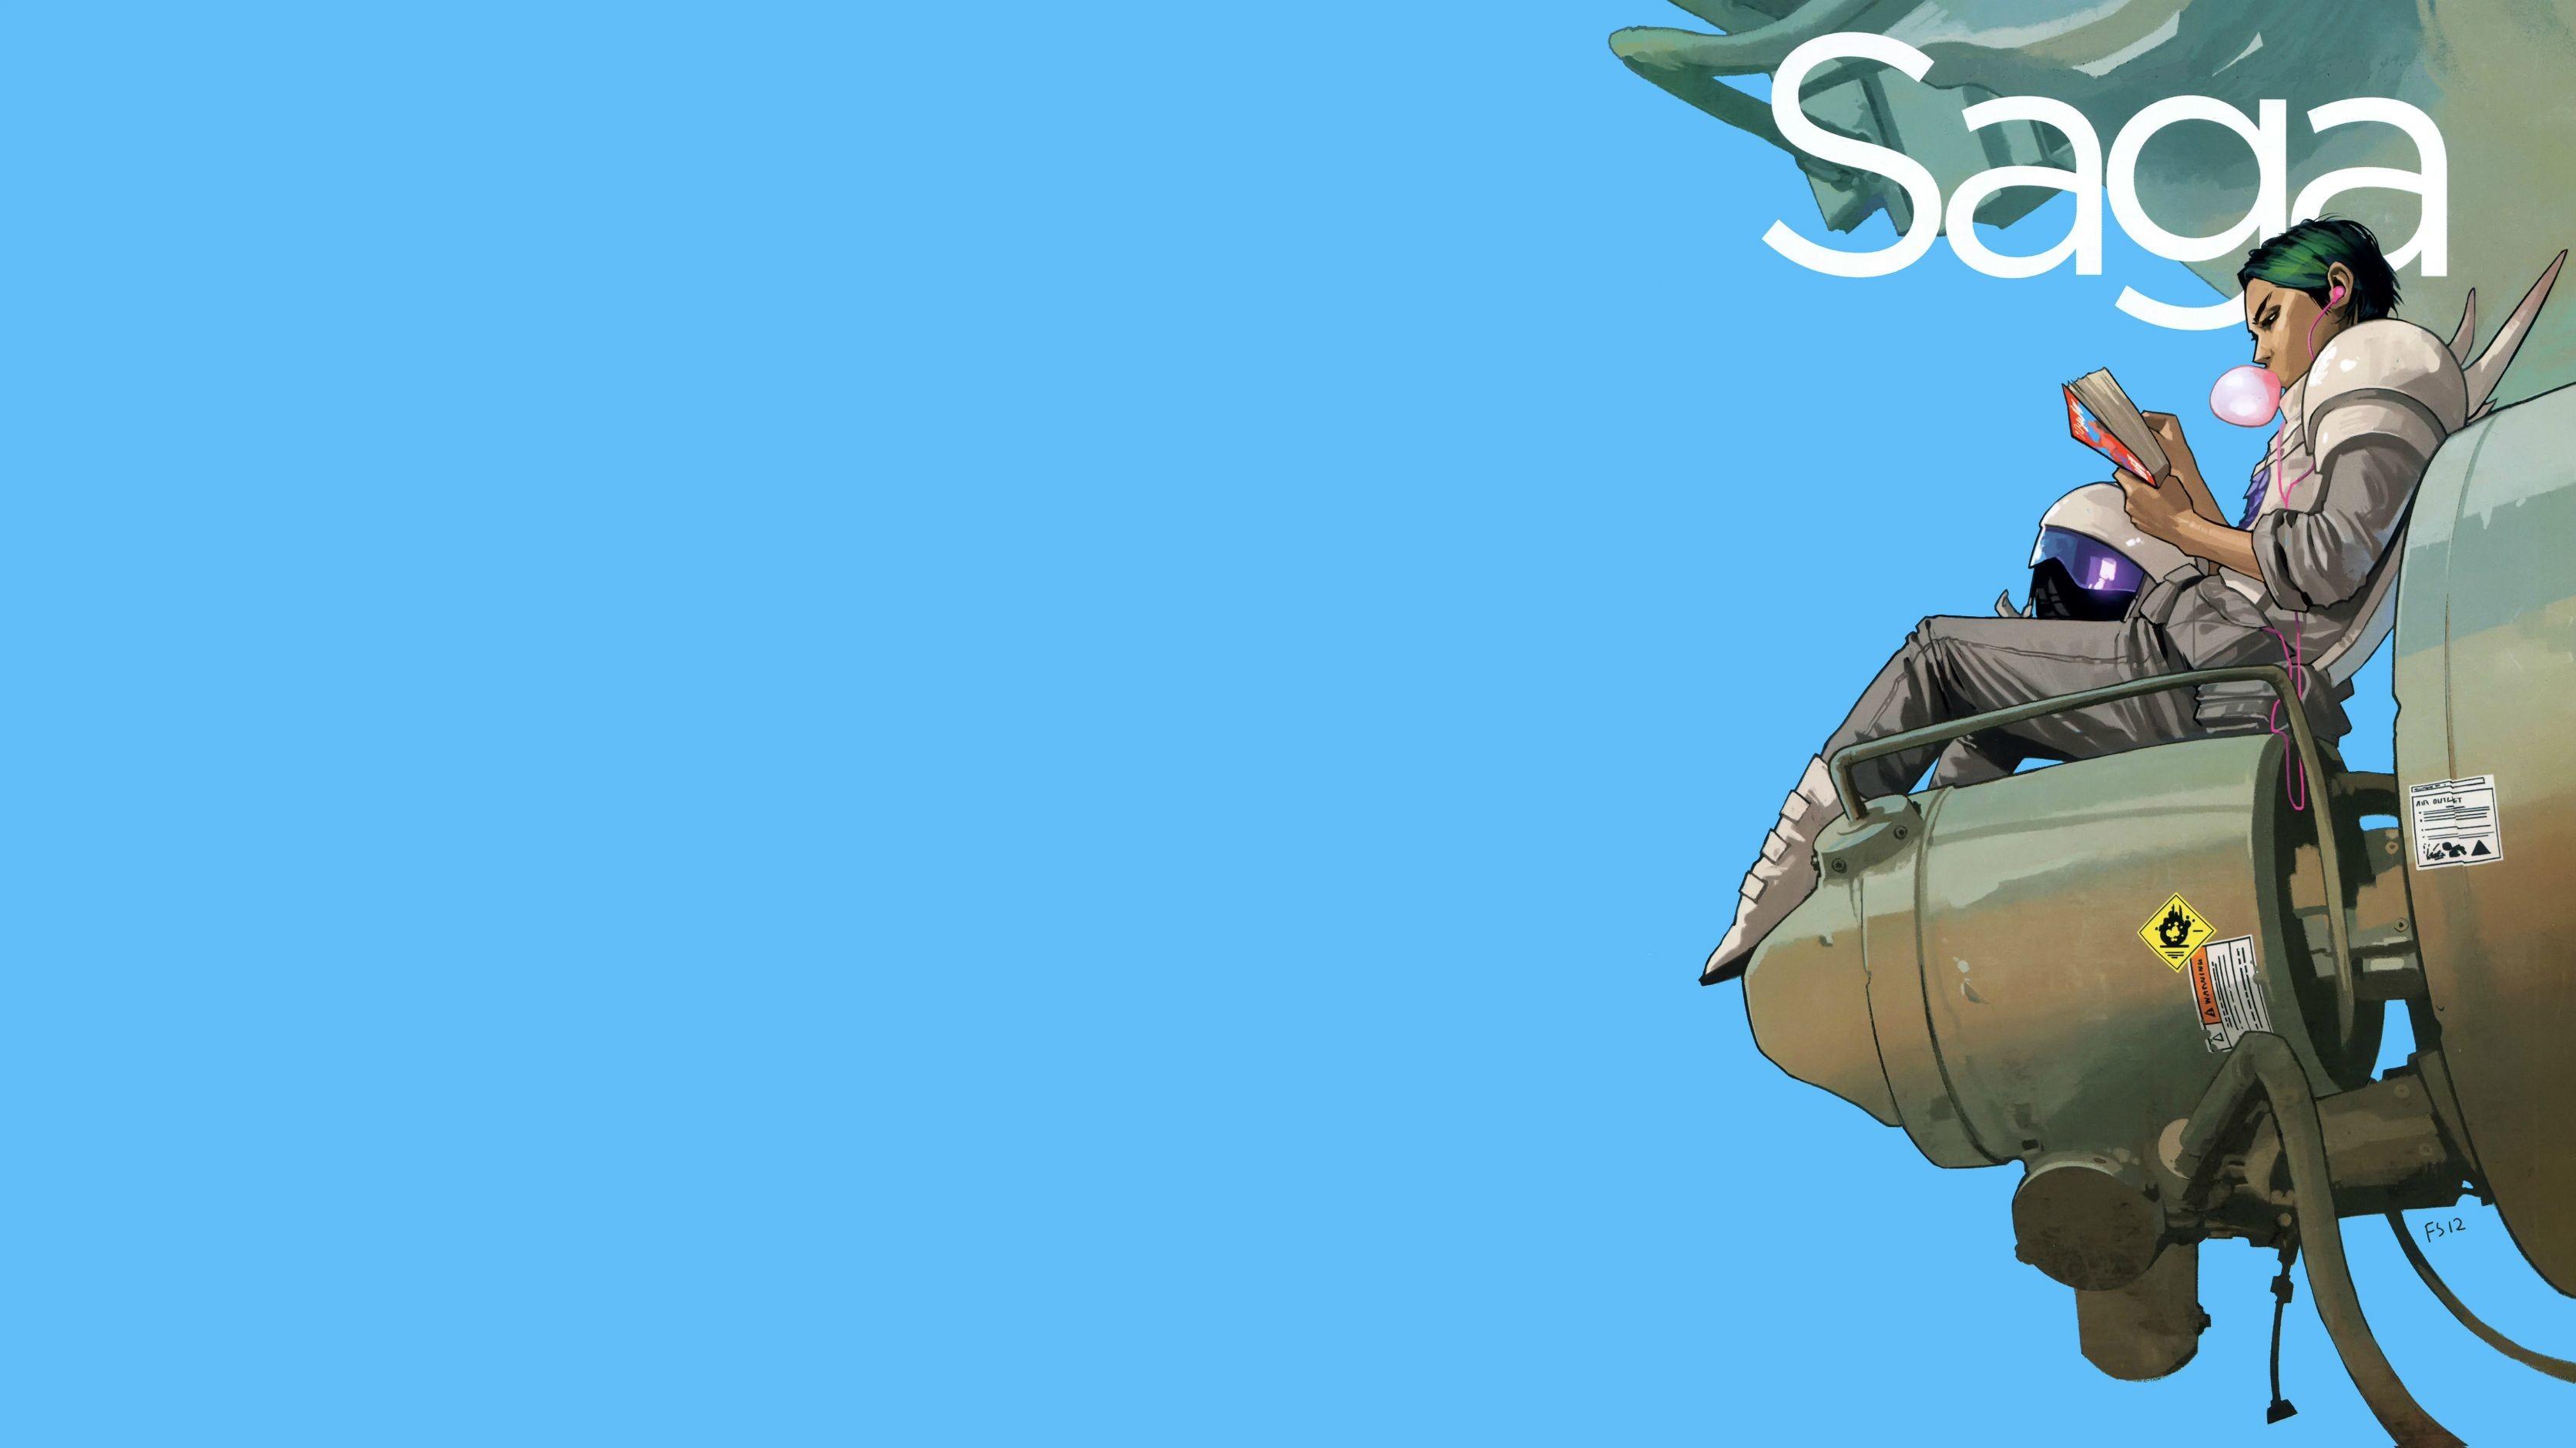 General 3344x1880 comics Saga Alana (Saga) simple background cyan cyan background